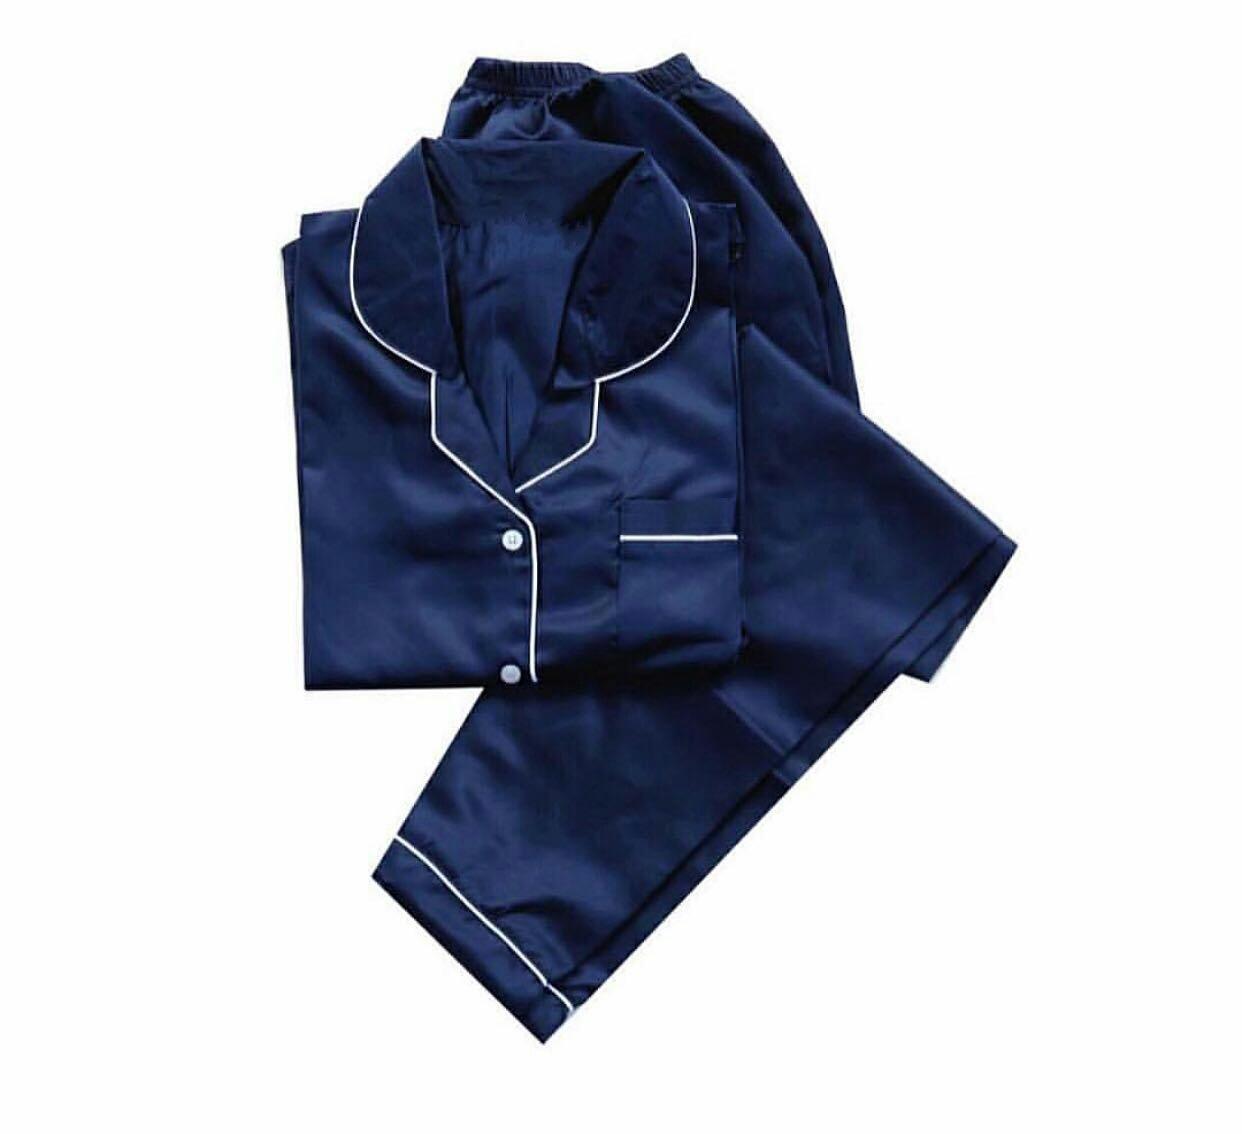 baju bobok/ baju tidur terlaris-baju tidur ter update-s'cokey/ baju tidur/pakaian tidur wanita/ pak